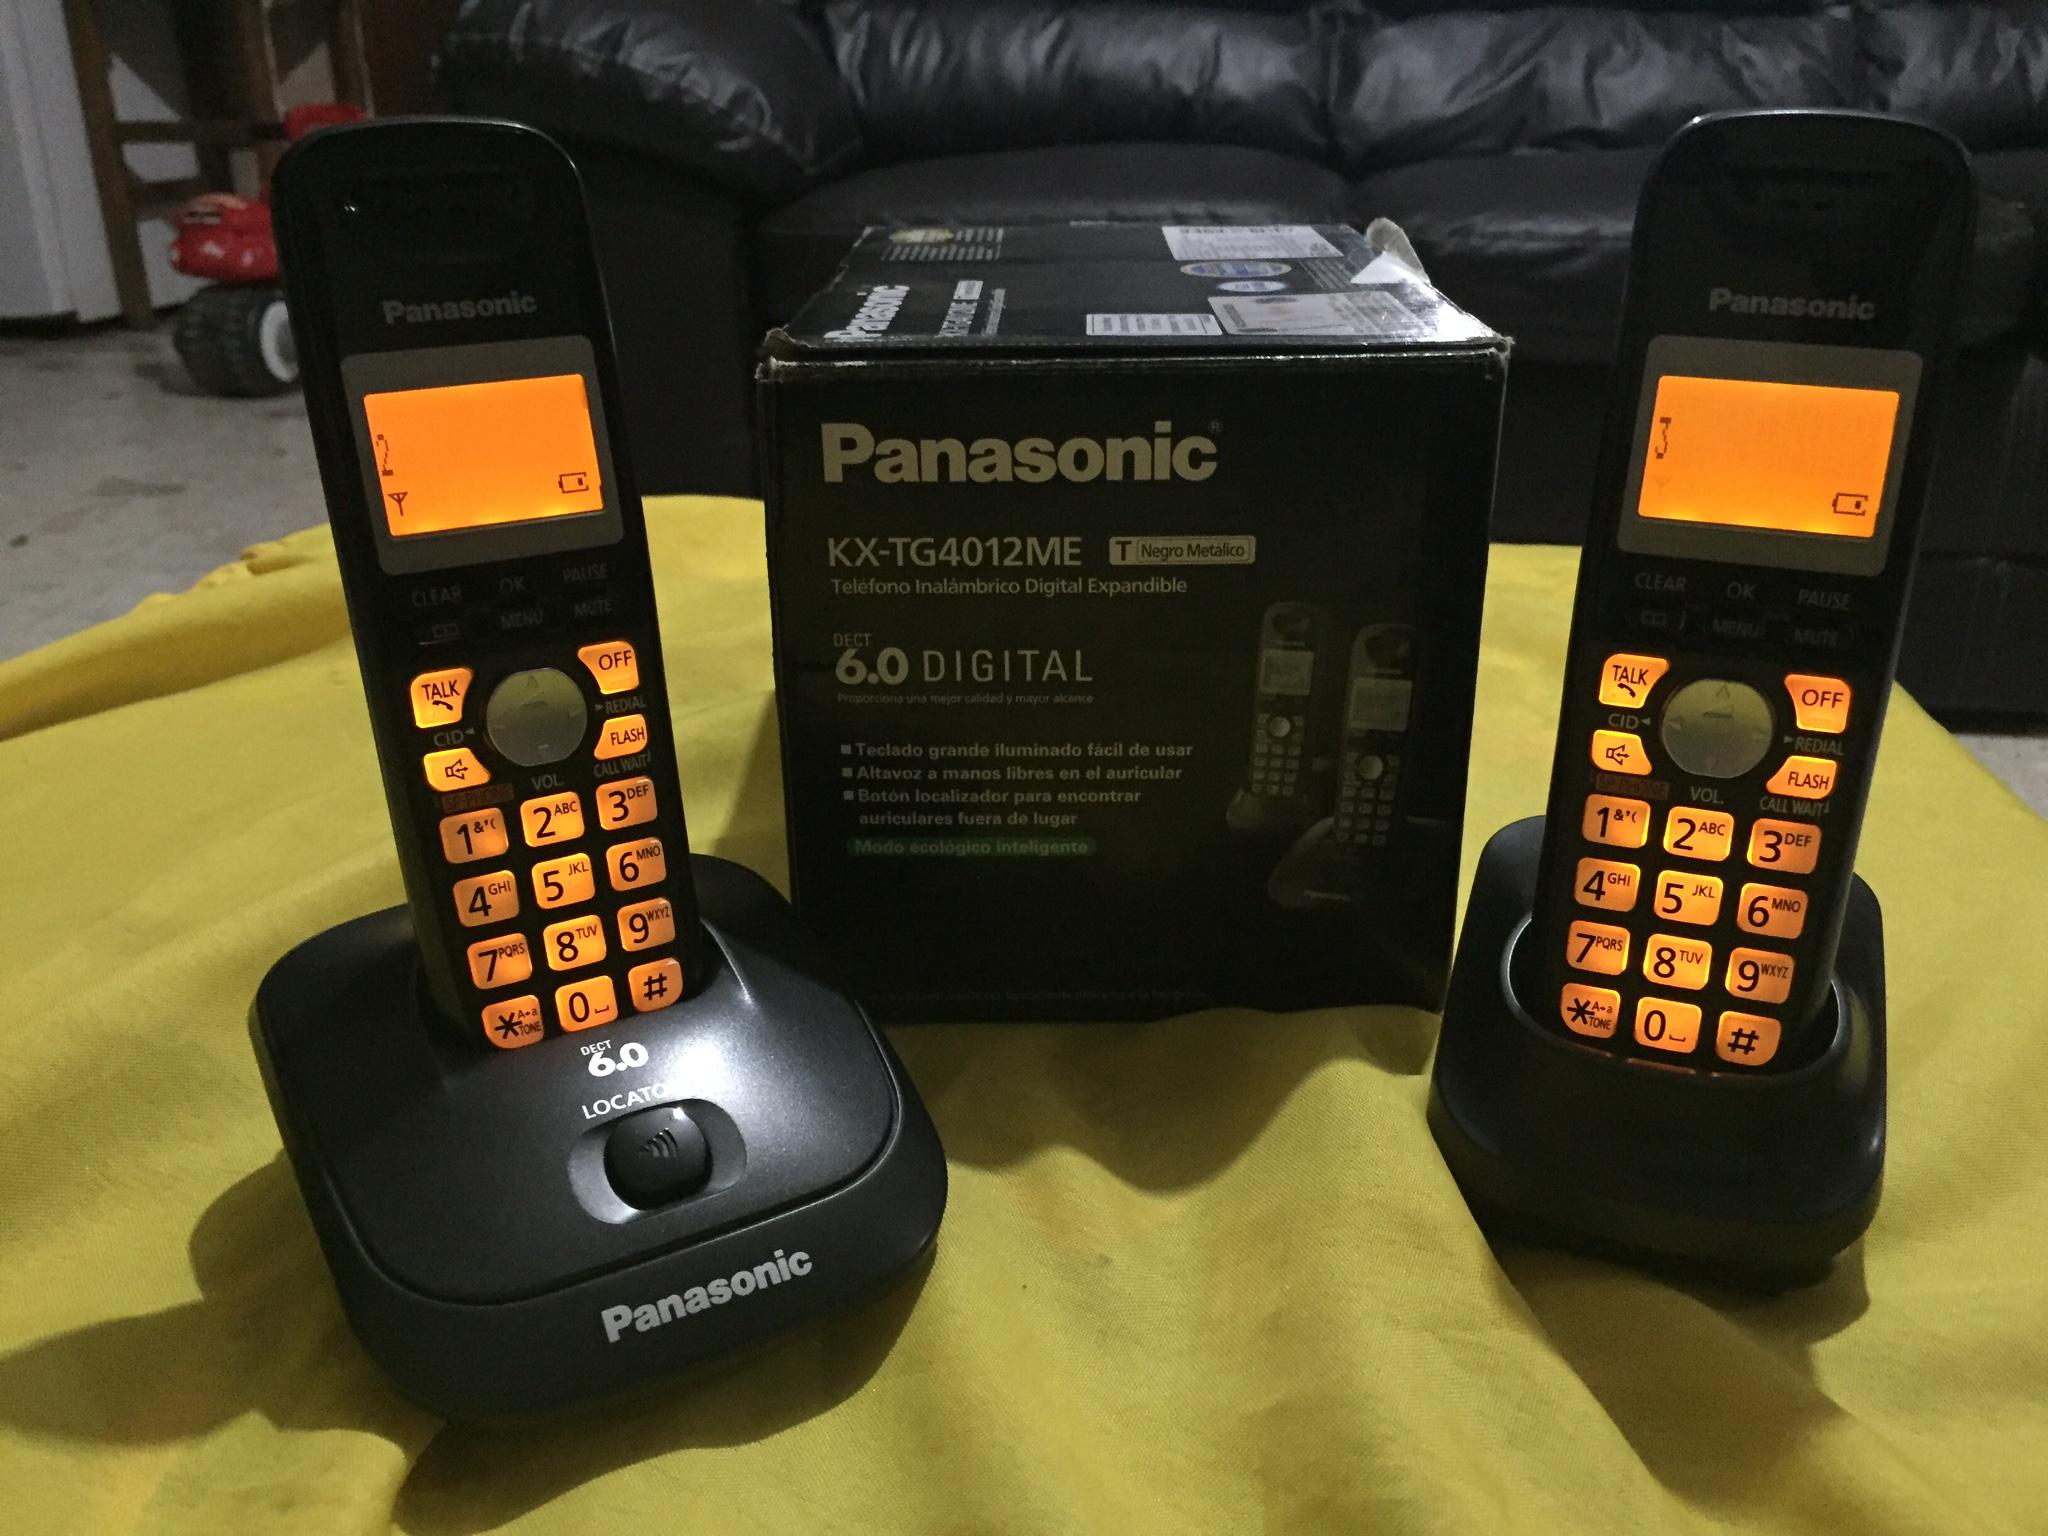 Elektra Remates Toluca: Par de teléfonos Panasonic 6.0 a $300